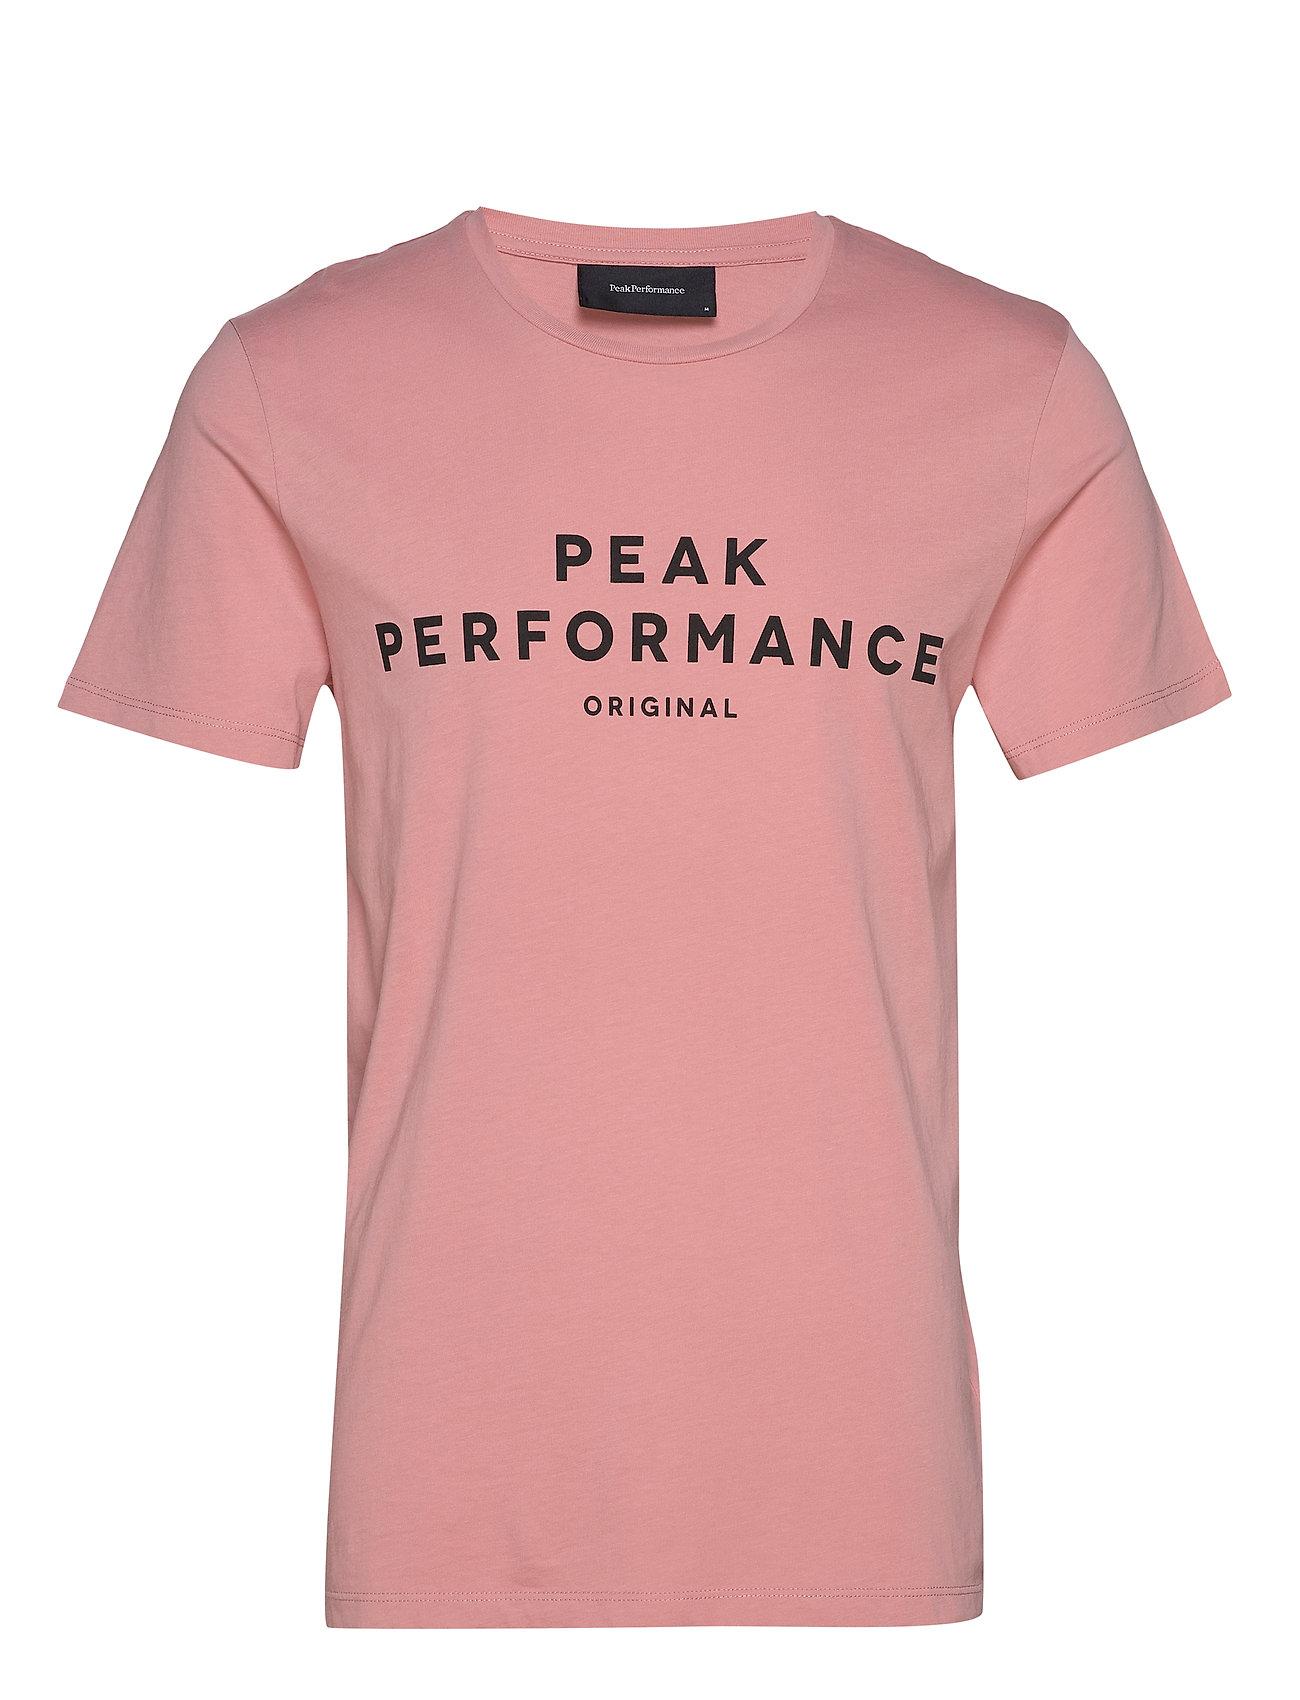 Peak Performance M ORIG TEE - DESERT ROSE